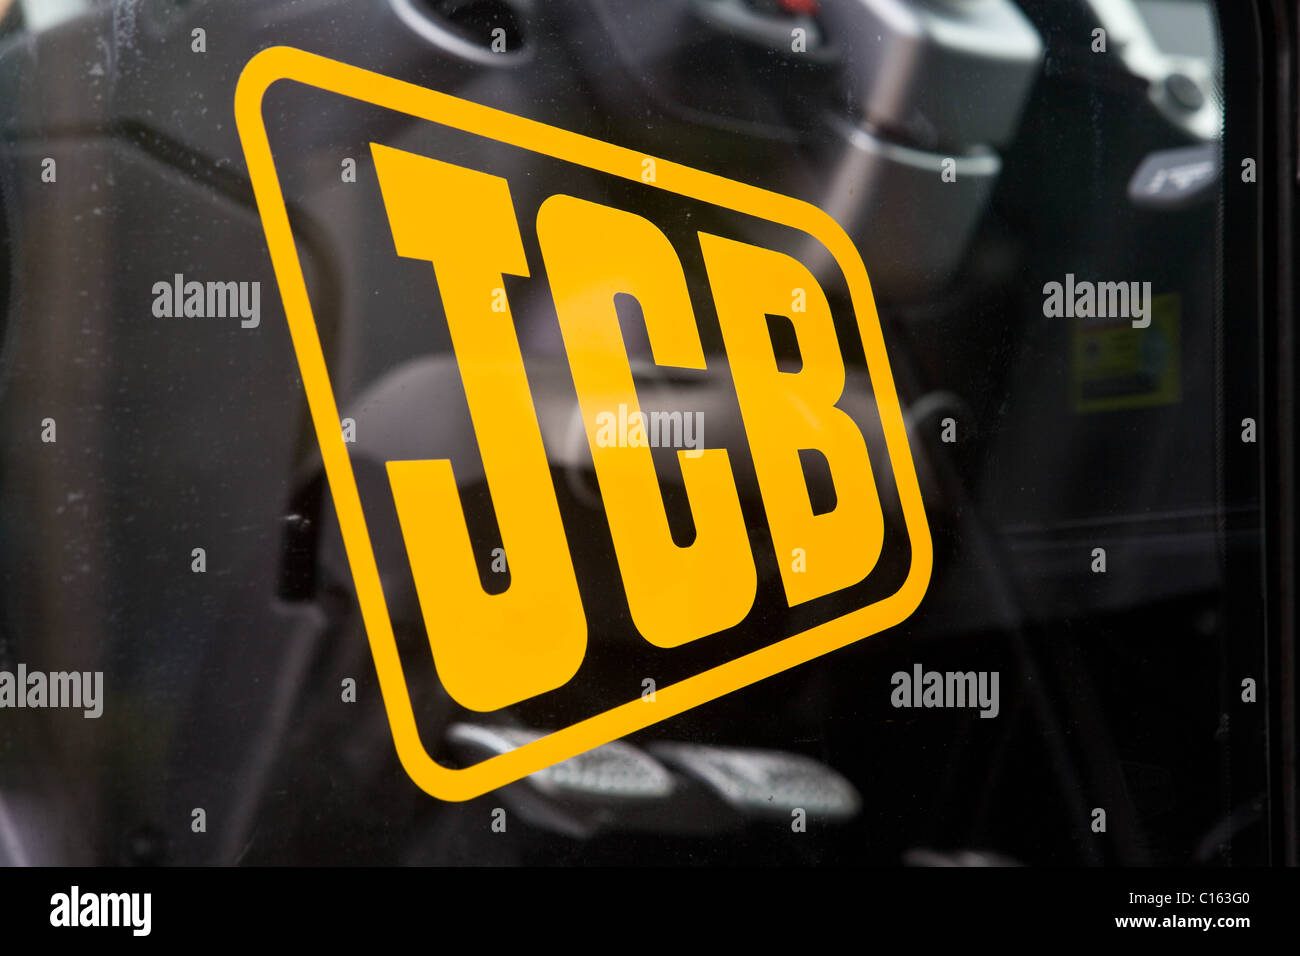 Jcb Company Stock Photos & Jcb Company Stock Images - Alamy